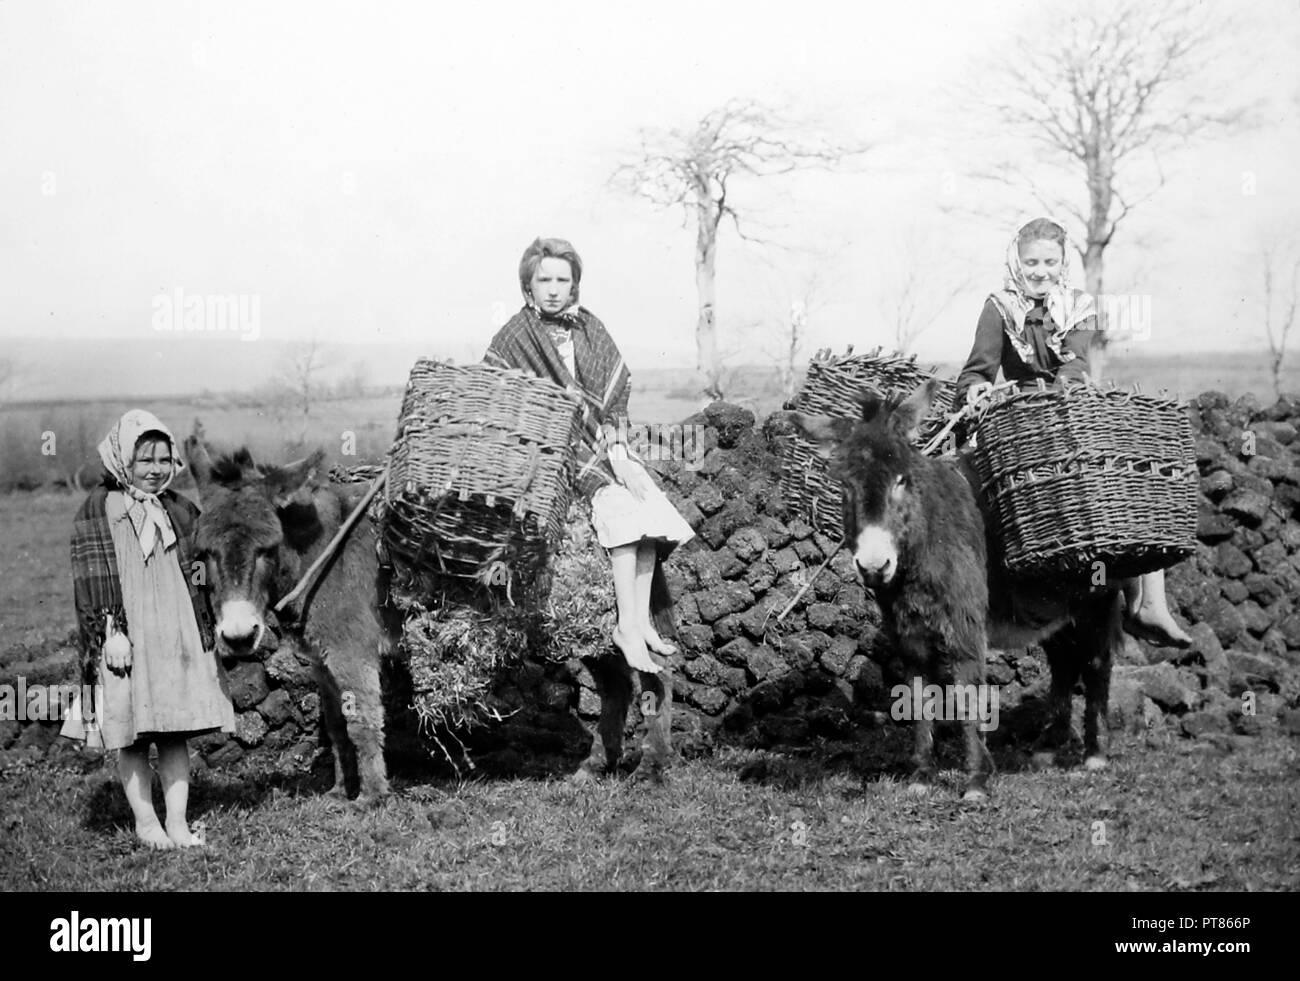 Carrying turf, Co Mayo, West of Ireland, early 1900s - Stock Image